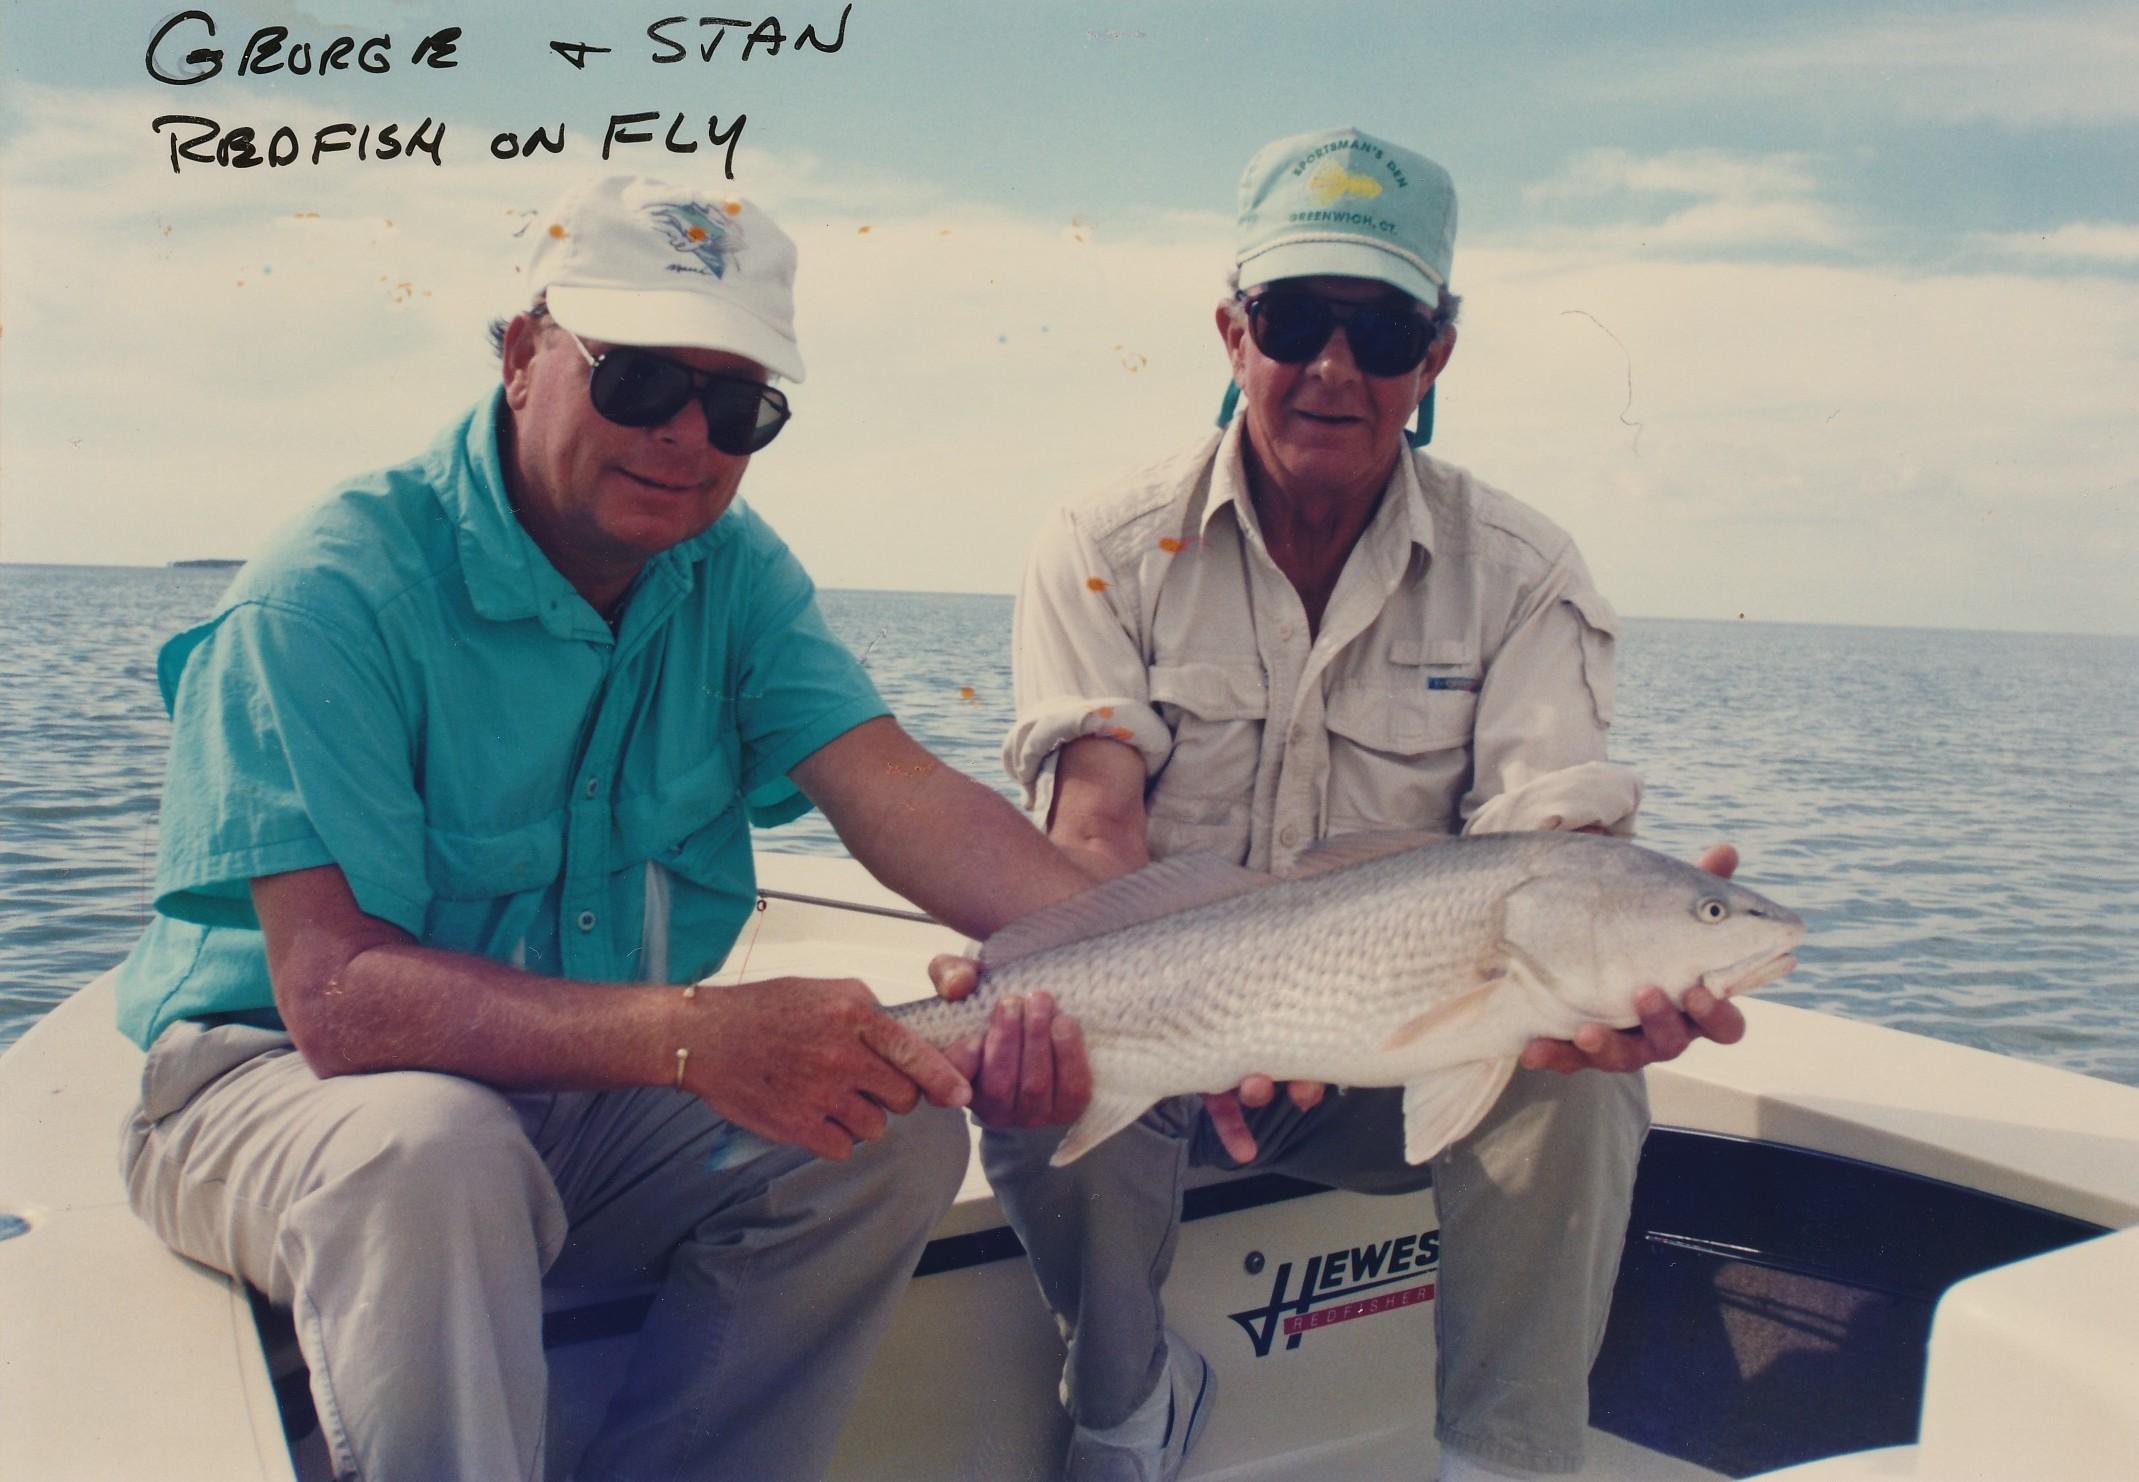 redfish_Bugsy__Stan_2